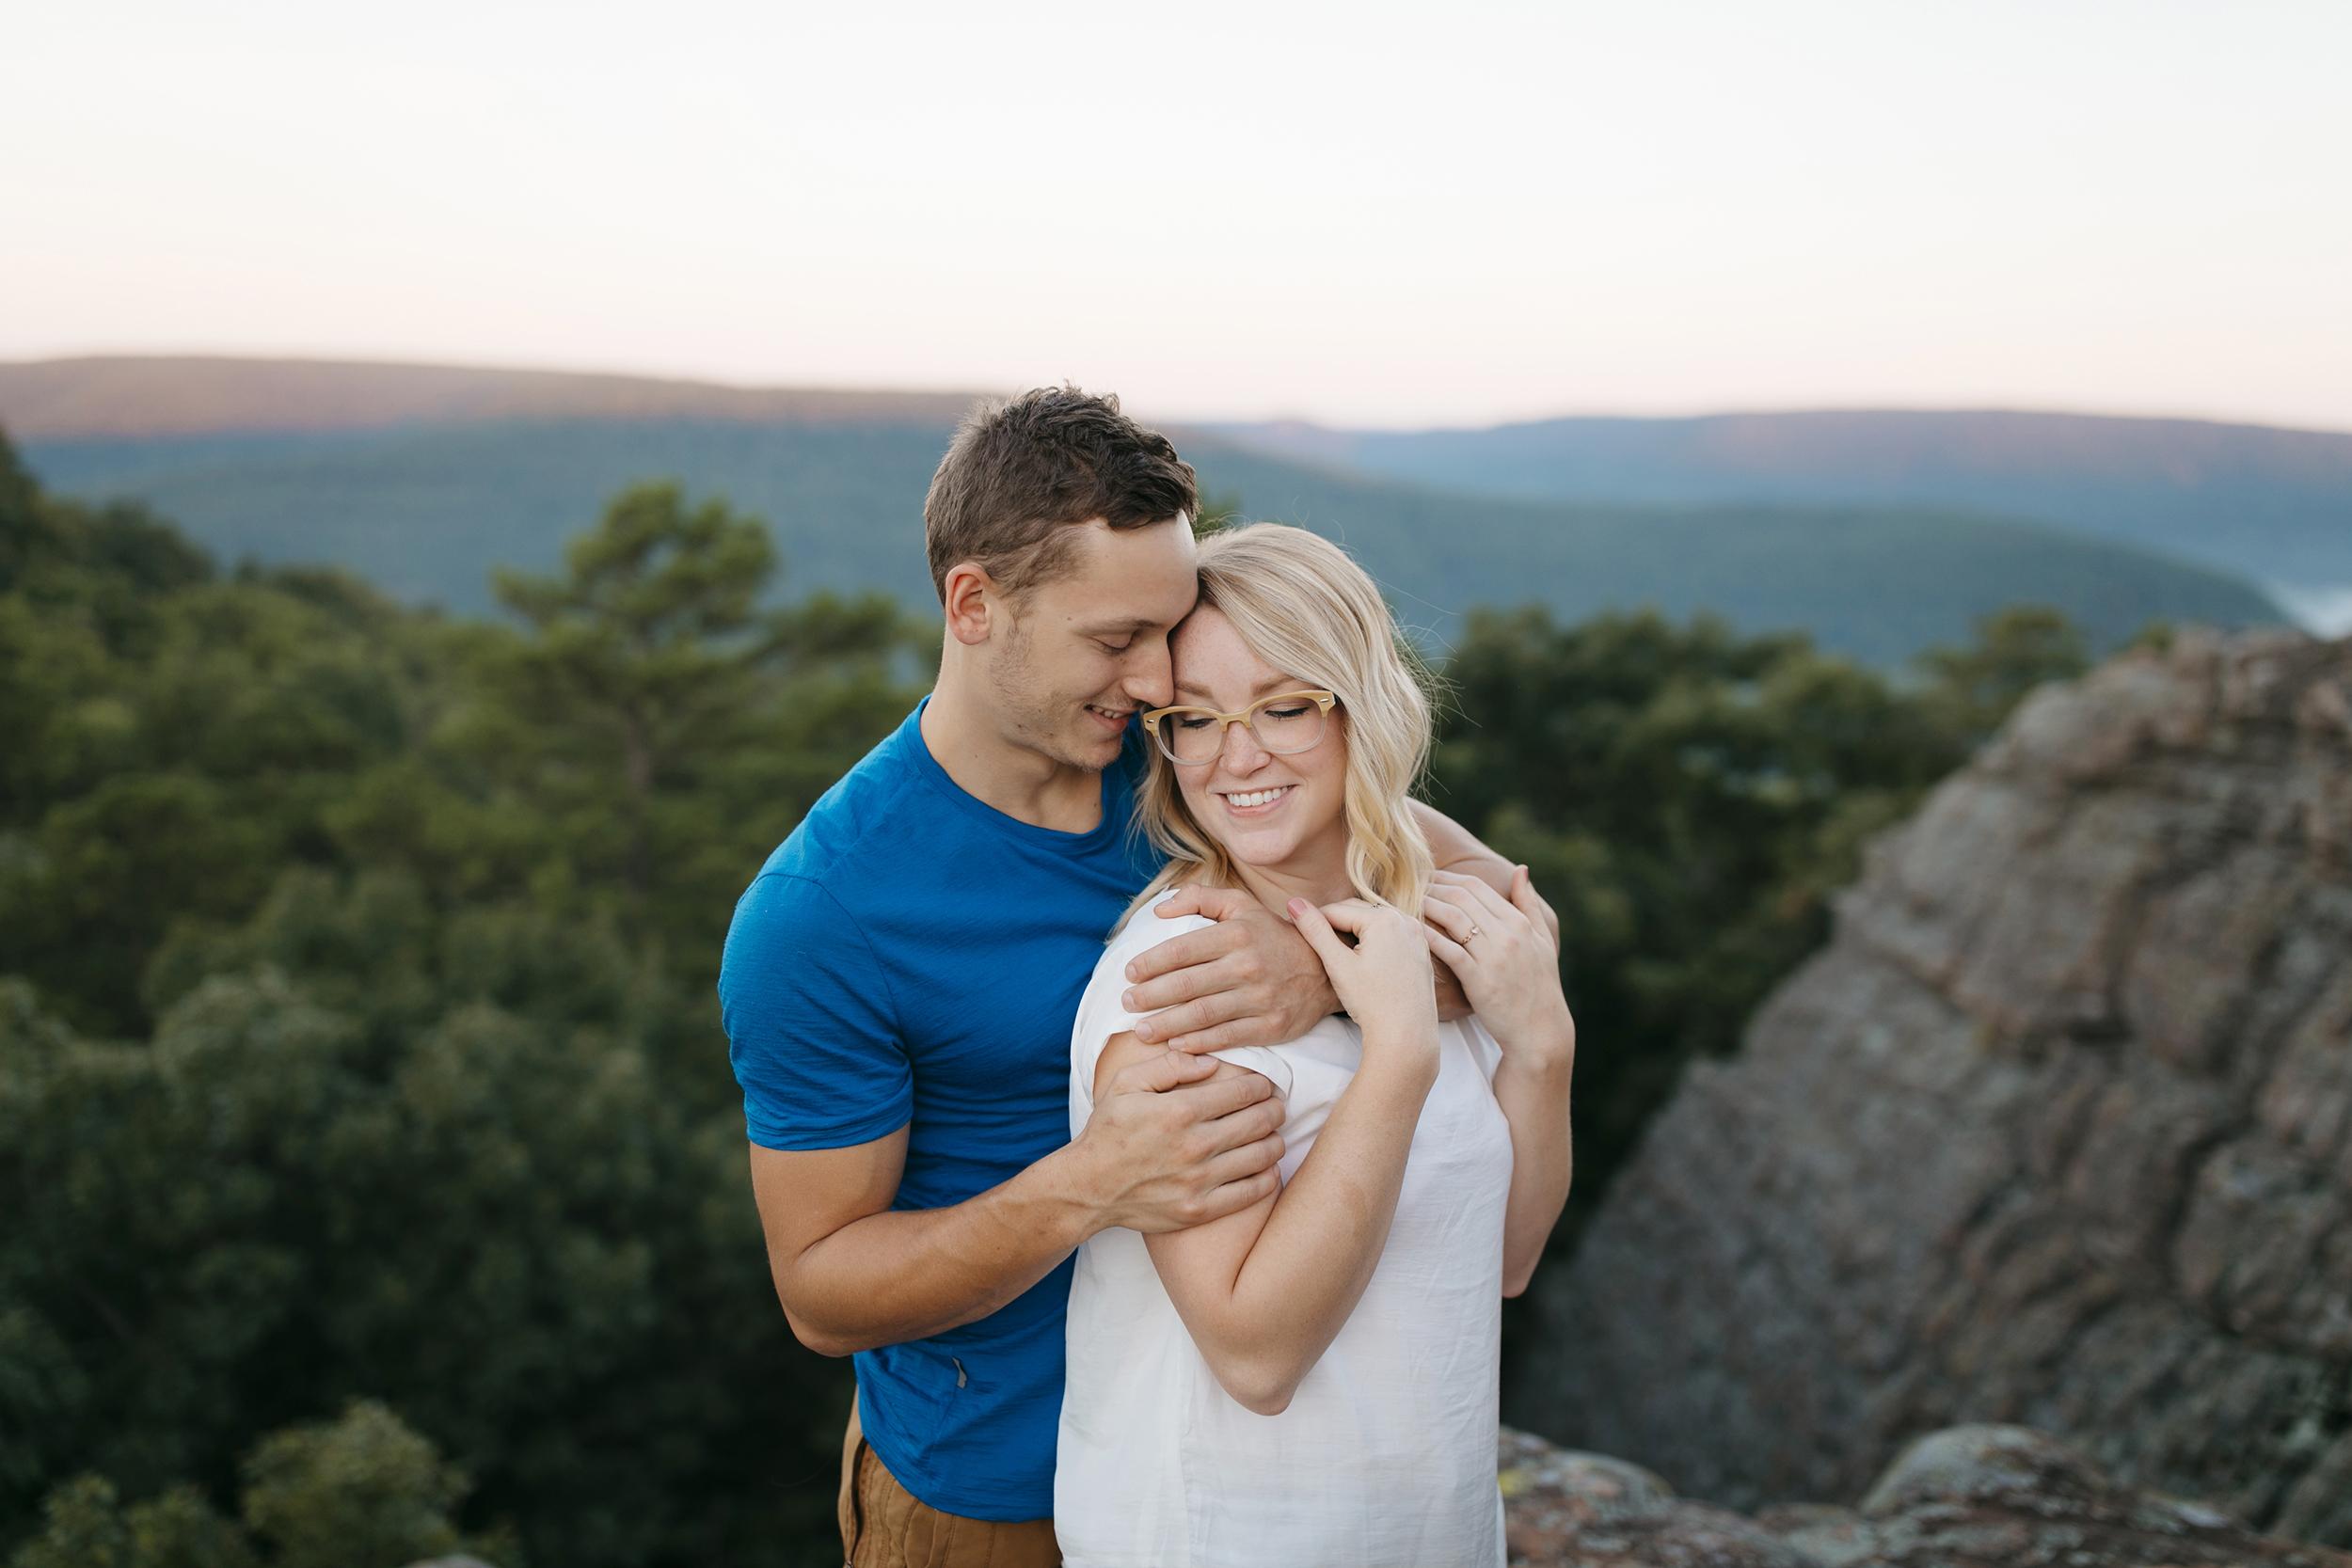 Buffalo-River-Arkansas-Sams-Throne-Adventure-Engagement-Photographer102.JPG